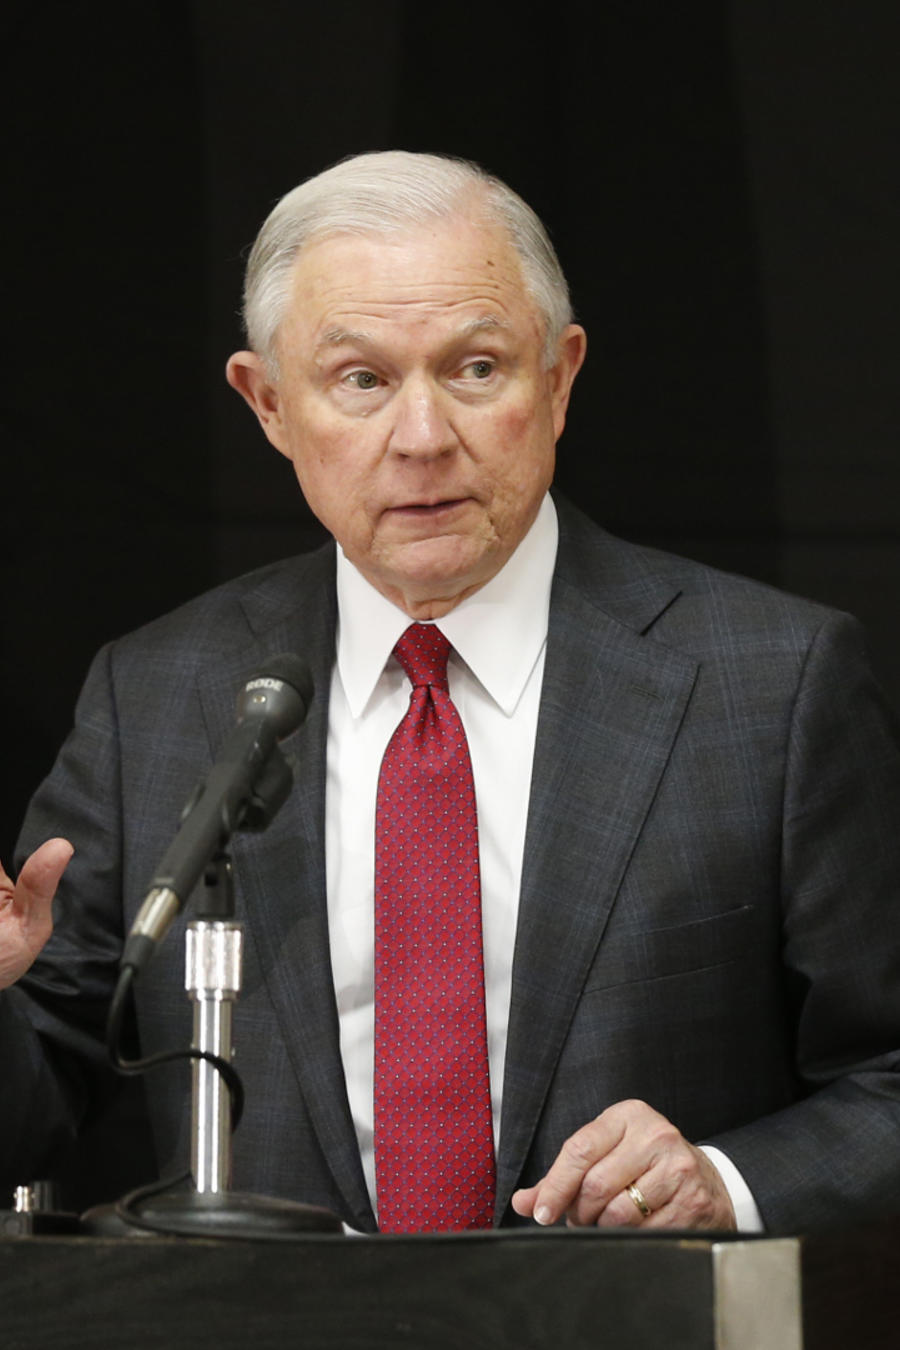 El fiscal general de EEUU, Jeff Sessions en conferencia de prensa